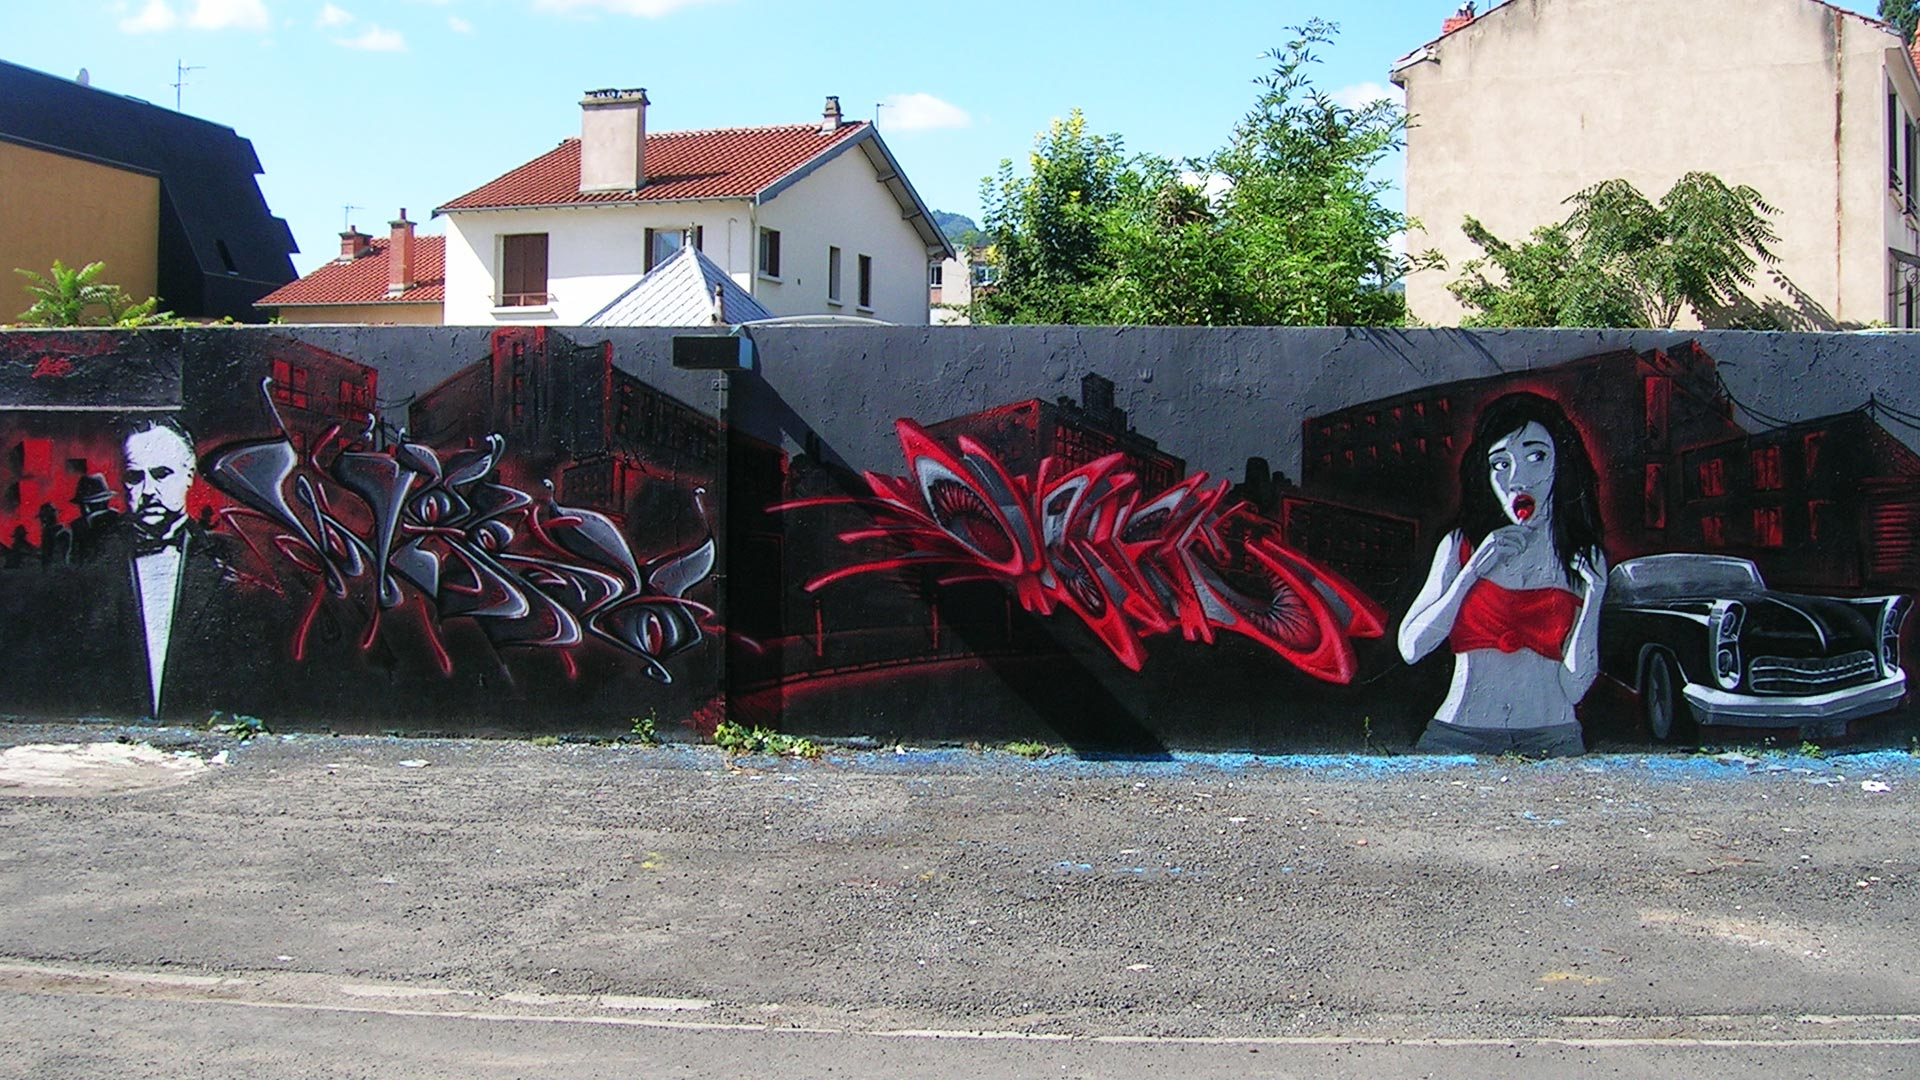 Epok, Waro & Deft - Fresque Mafiosa - Le Parrain - Graffiti